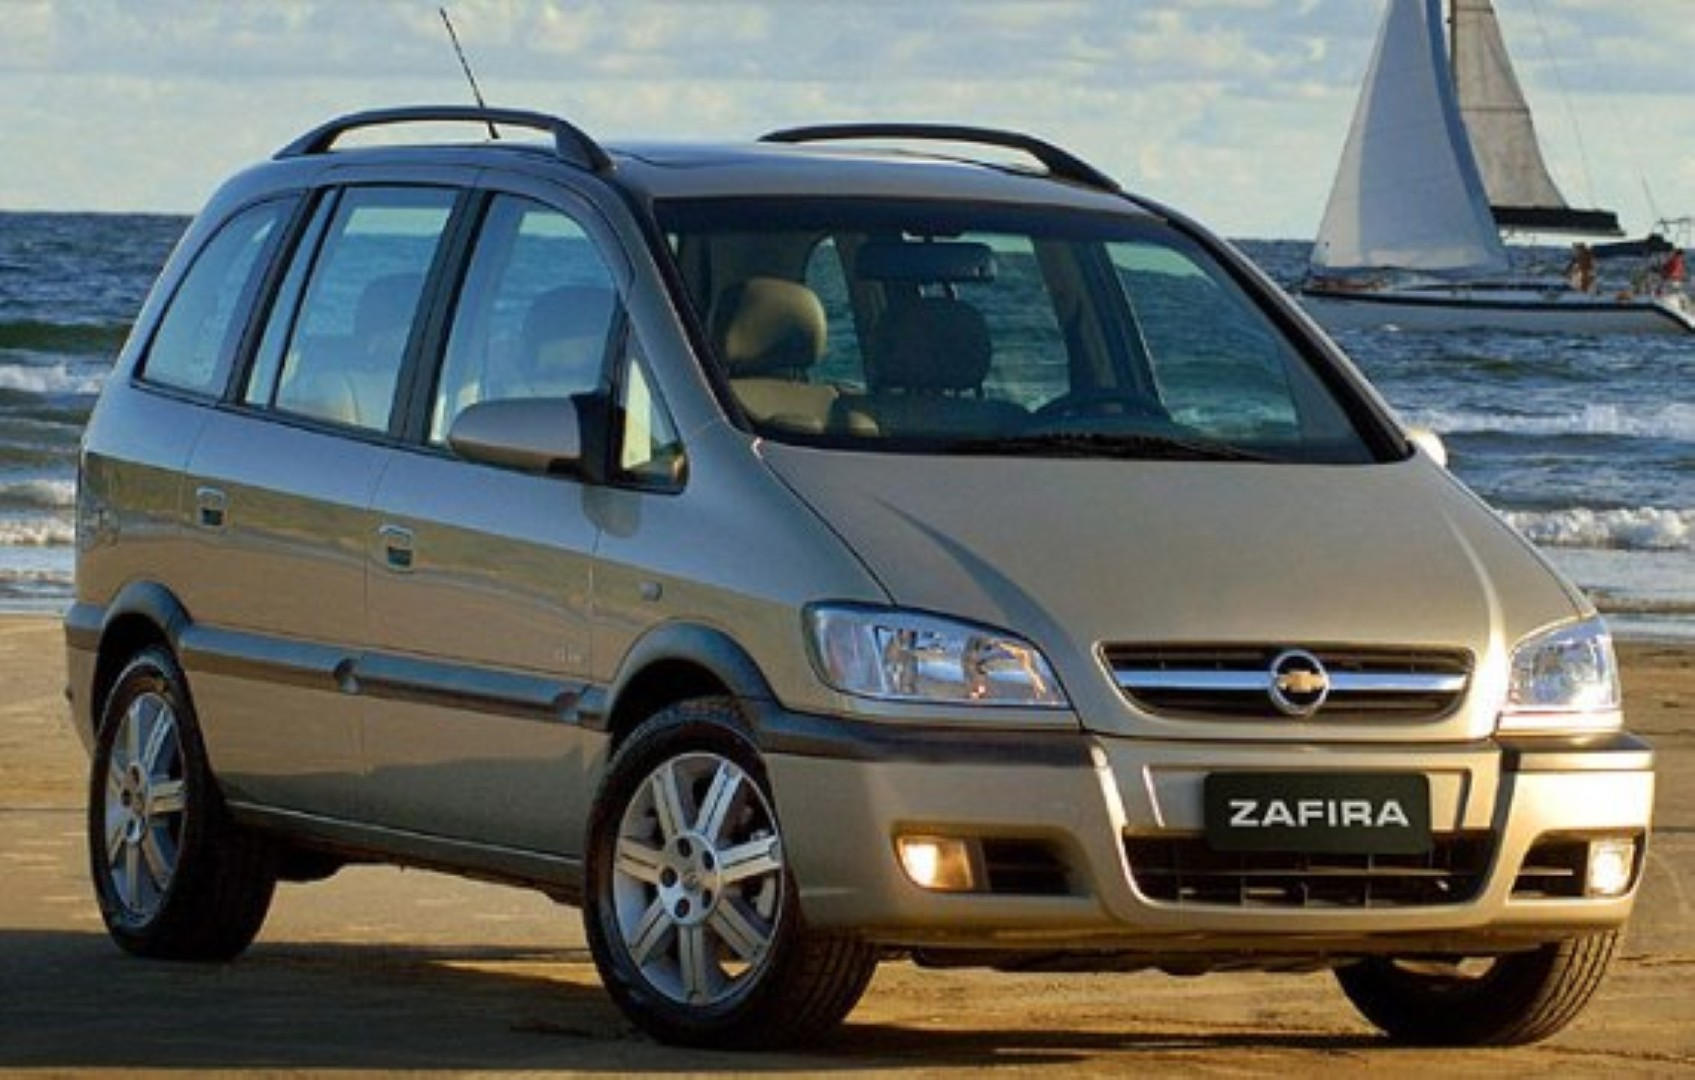 Chevrolet Zafira Car Technical Data  Car Specifications